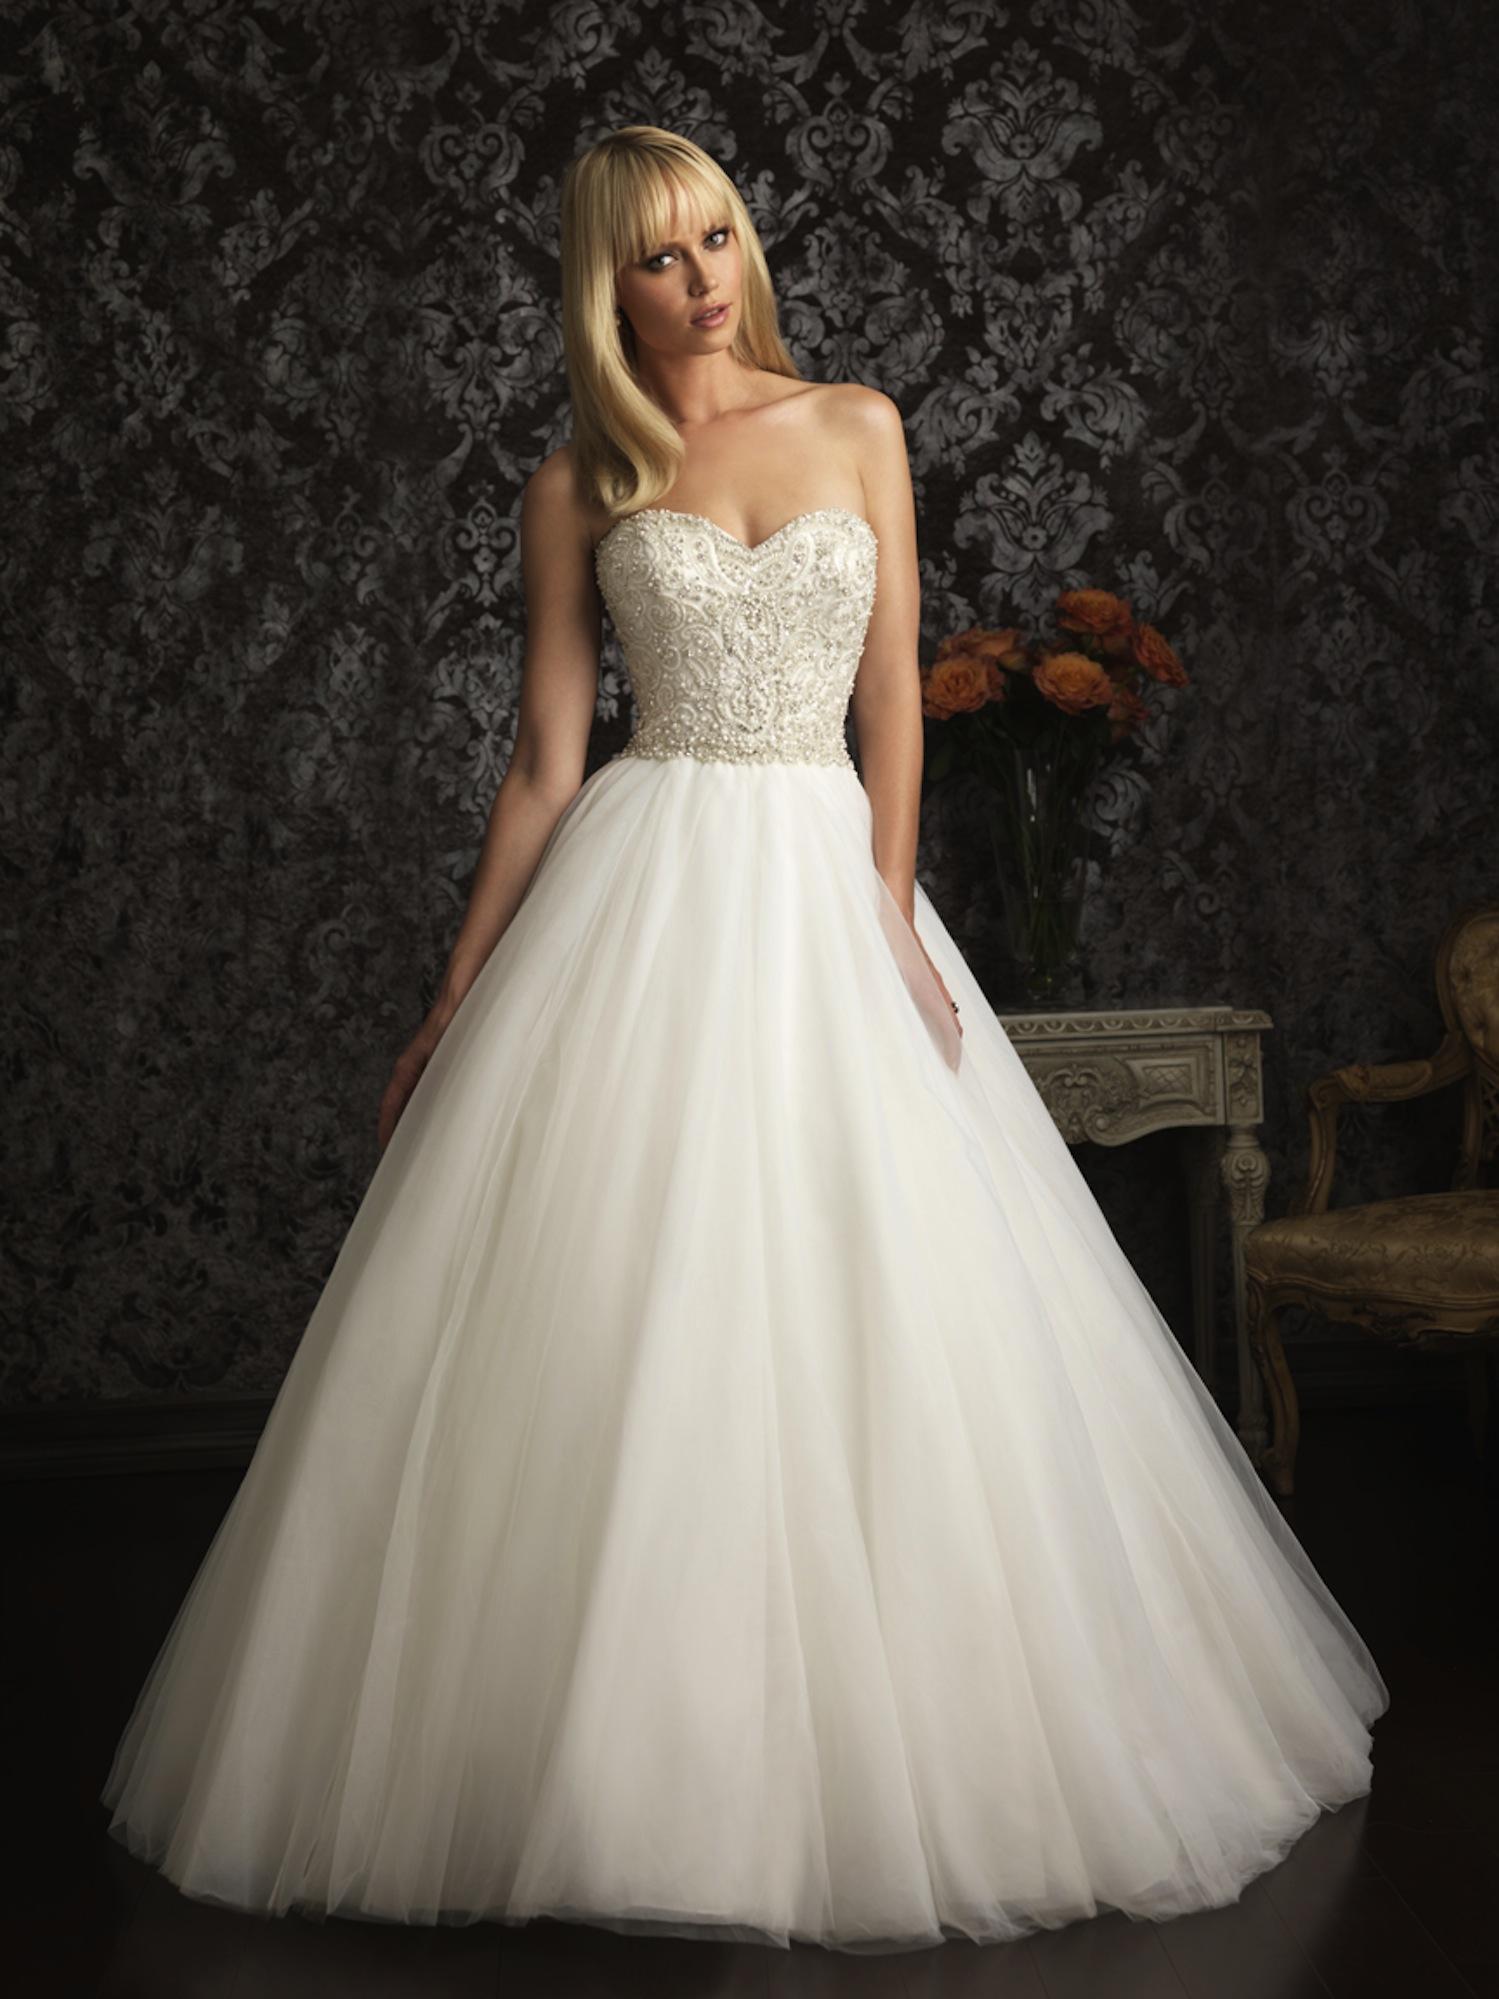 Allure Wedding Gowns 021 - Allure Wedding Gowns